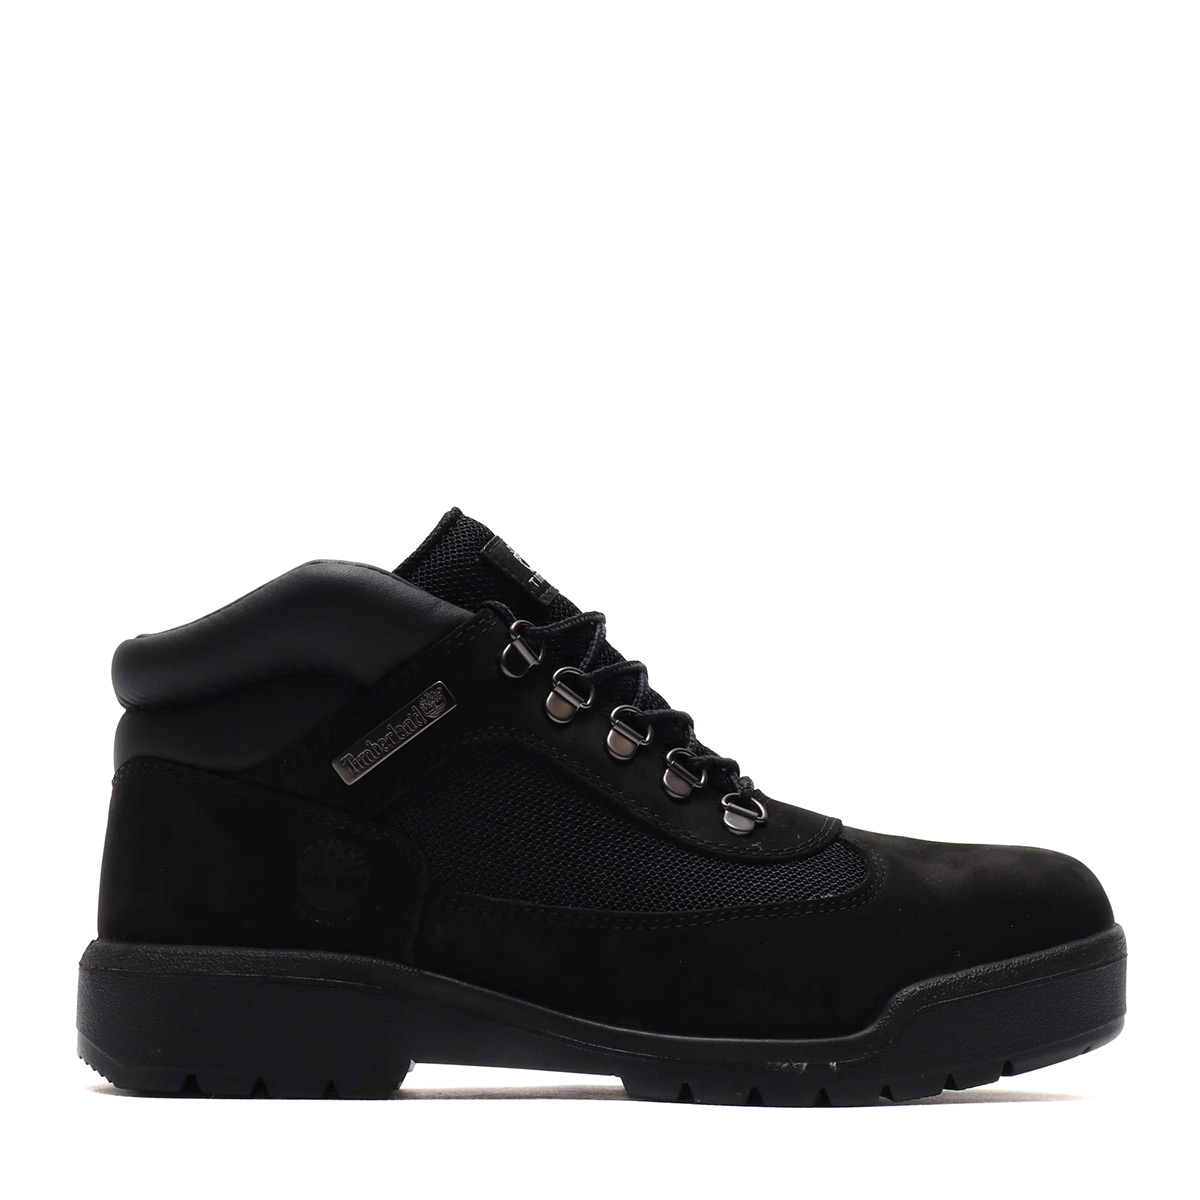 8d4aa68d7c1 Timberland FIELD BOOT (Black Nubuck) (Timberland field boots)